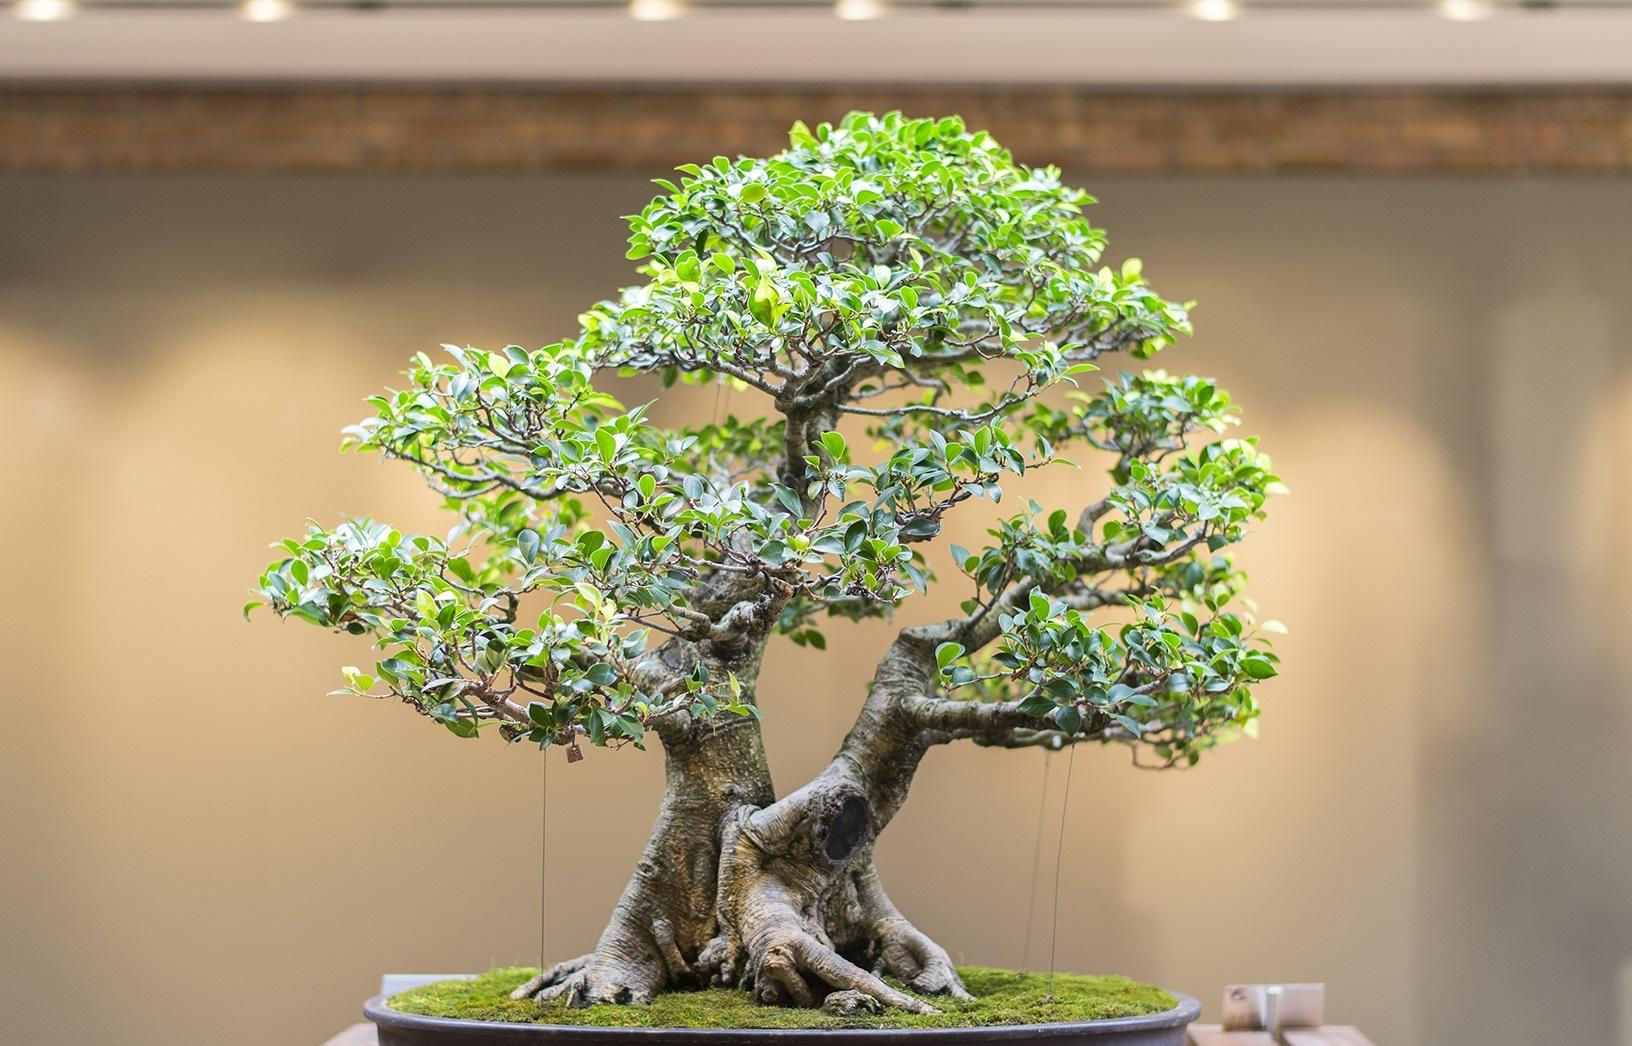 En büyük Bonsai ağacı